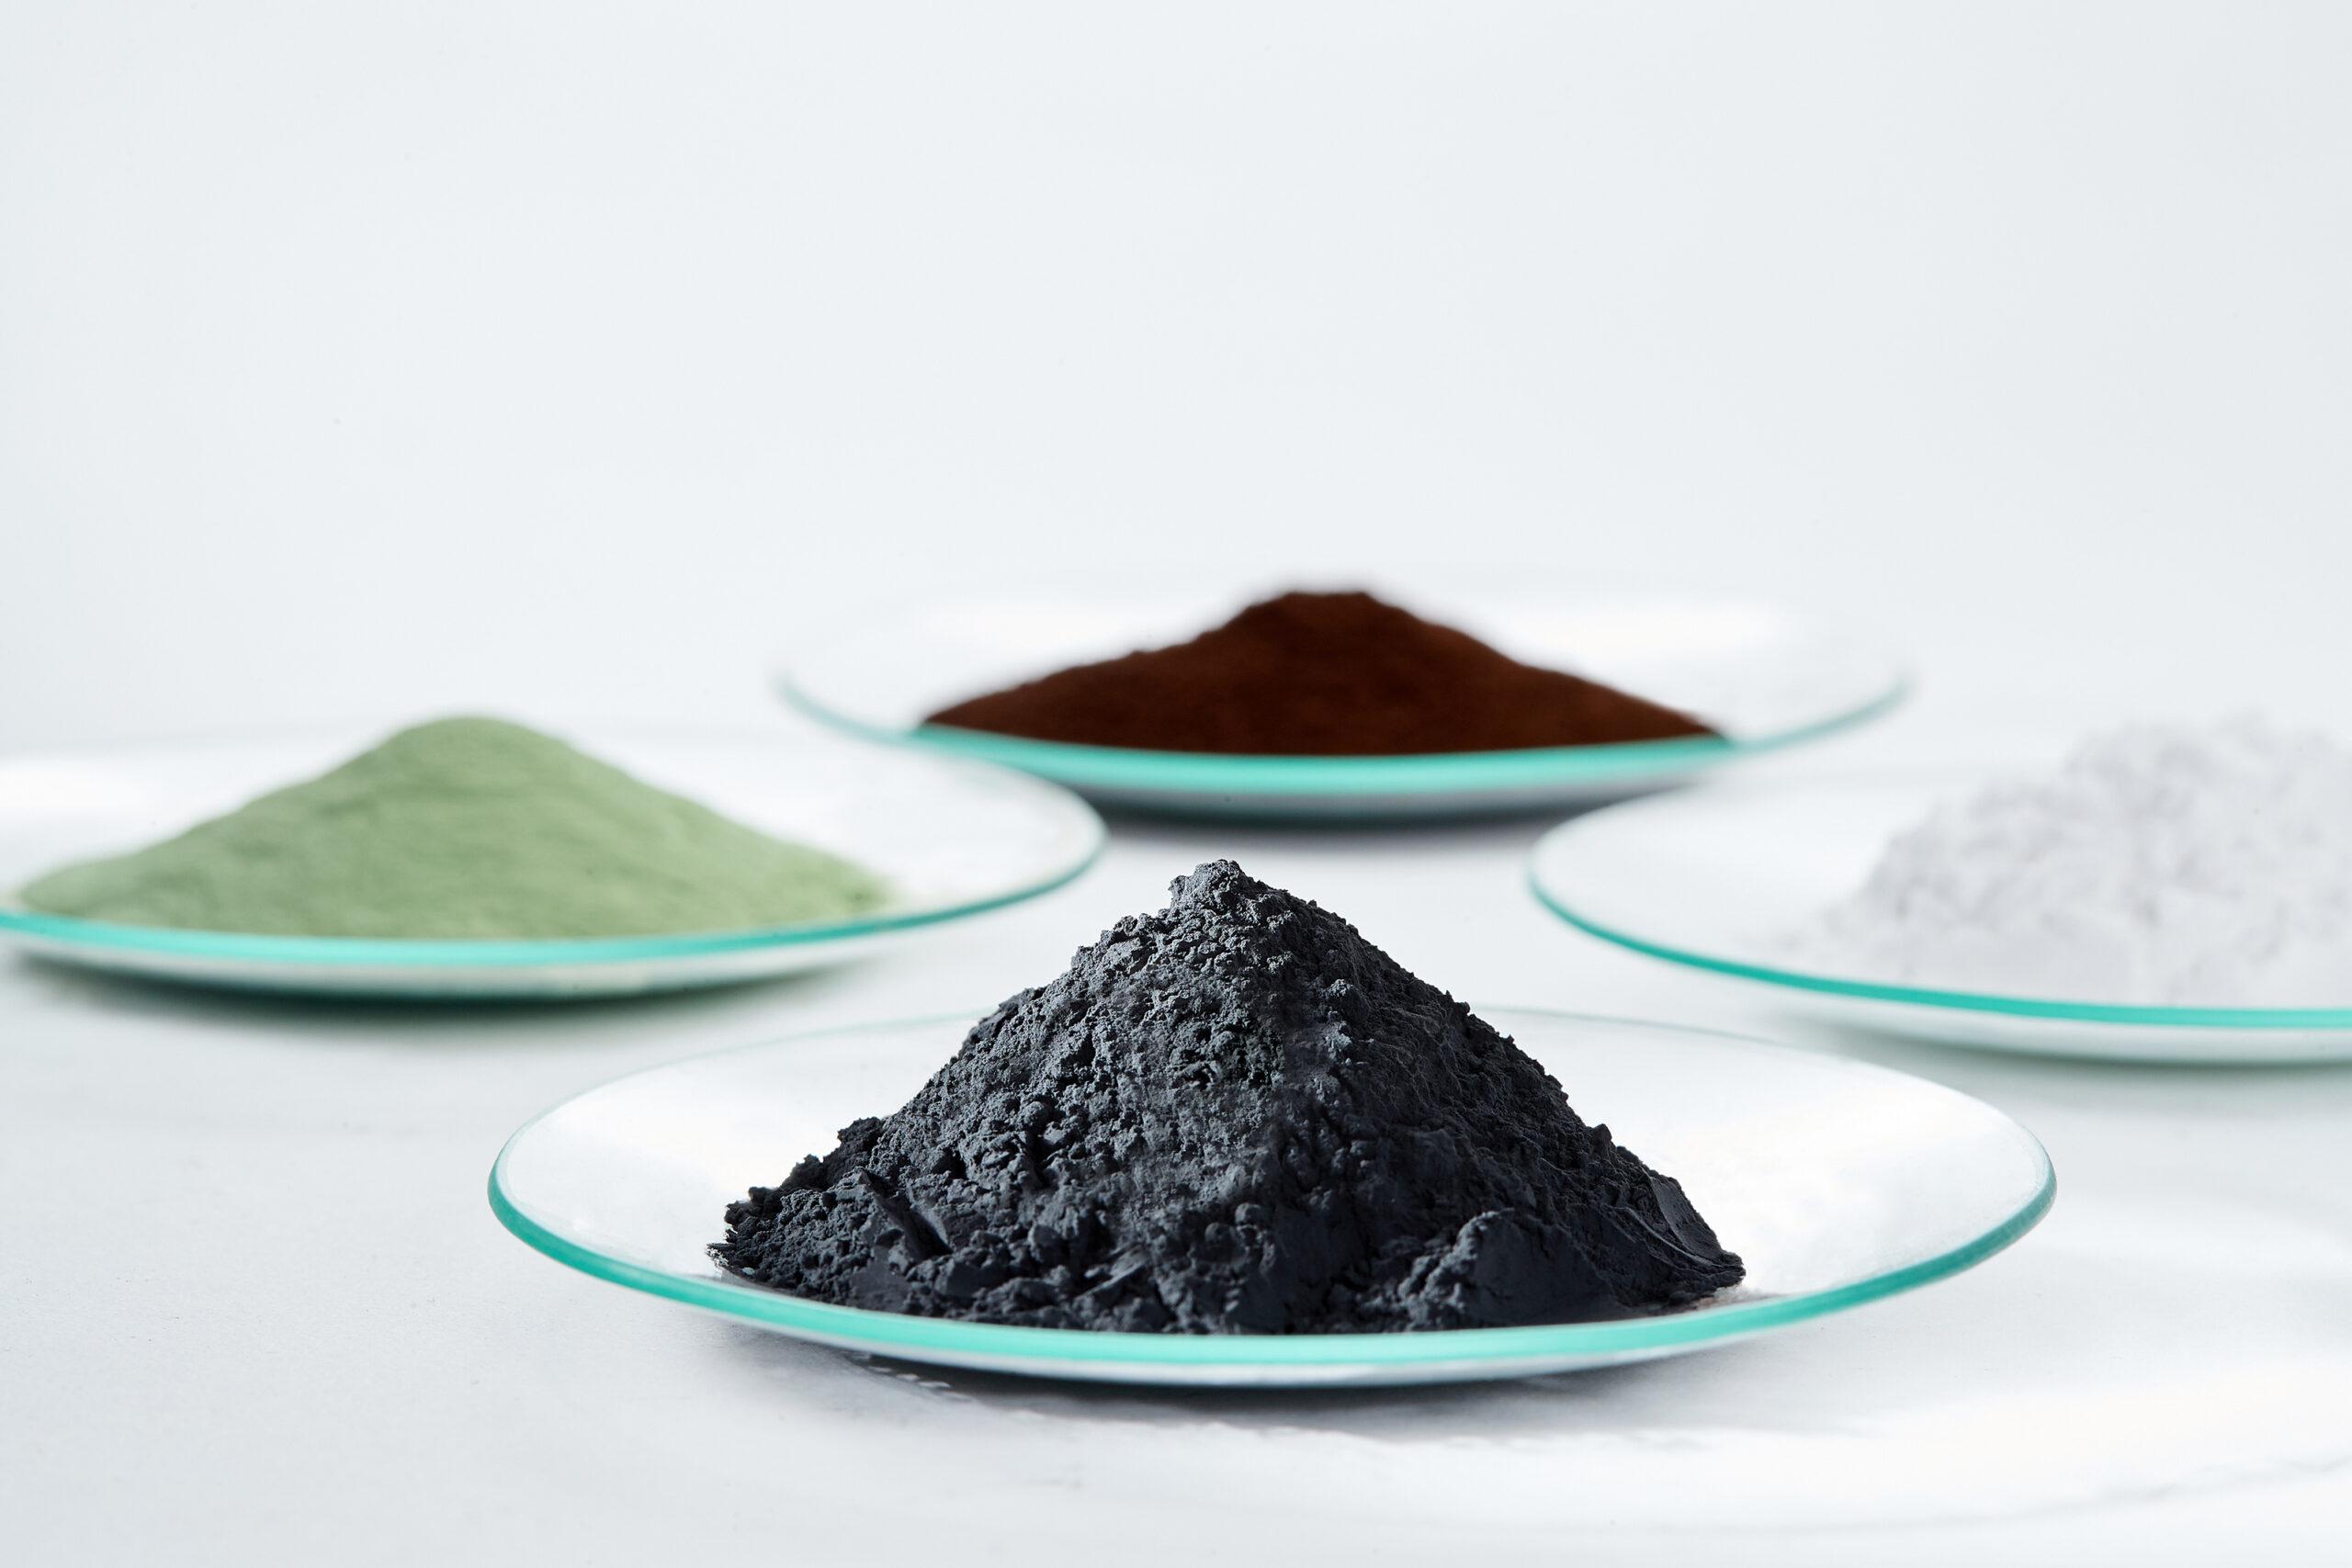 Key to powerful battery materials: Precursor cathode active materials (green and brown powder), lithium carbonate (white powder) and cathode active materials (black powder).